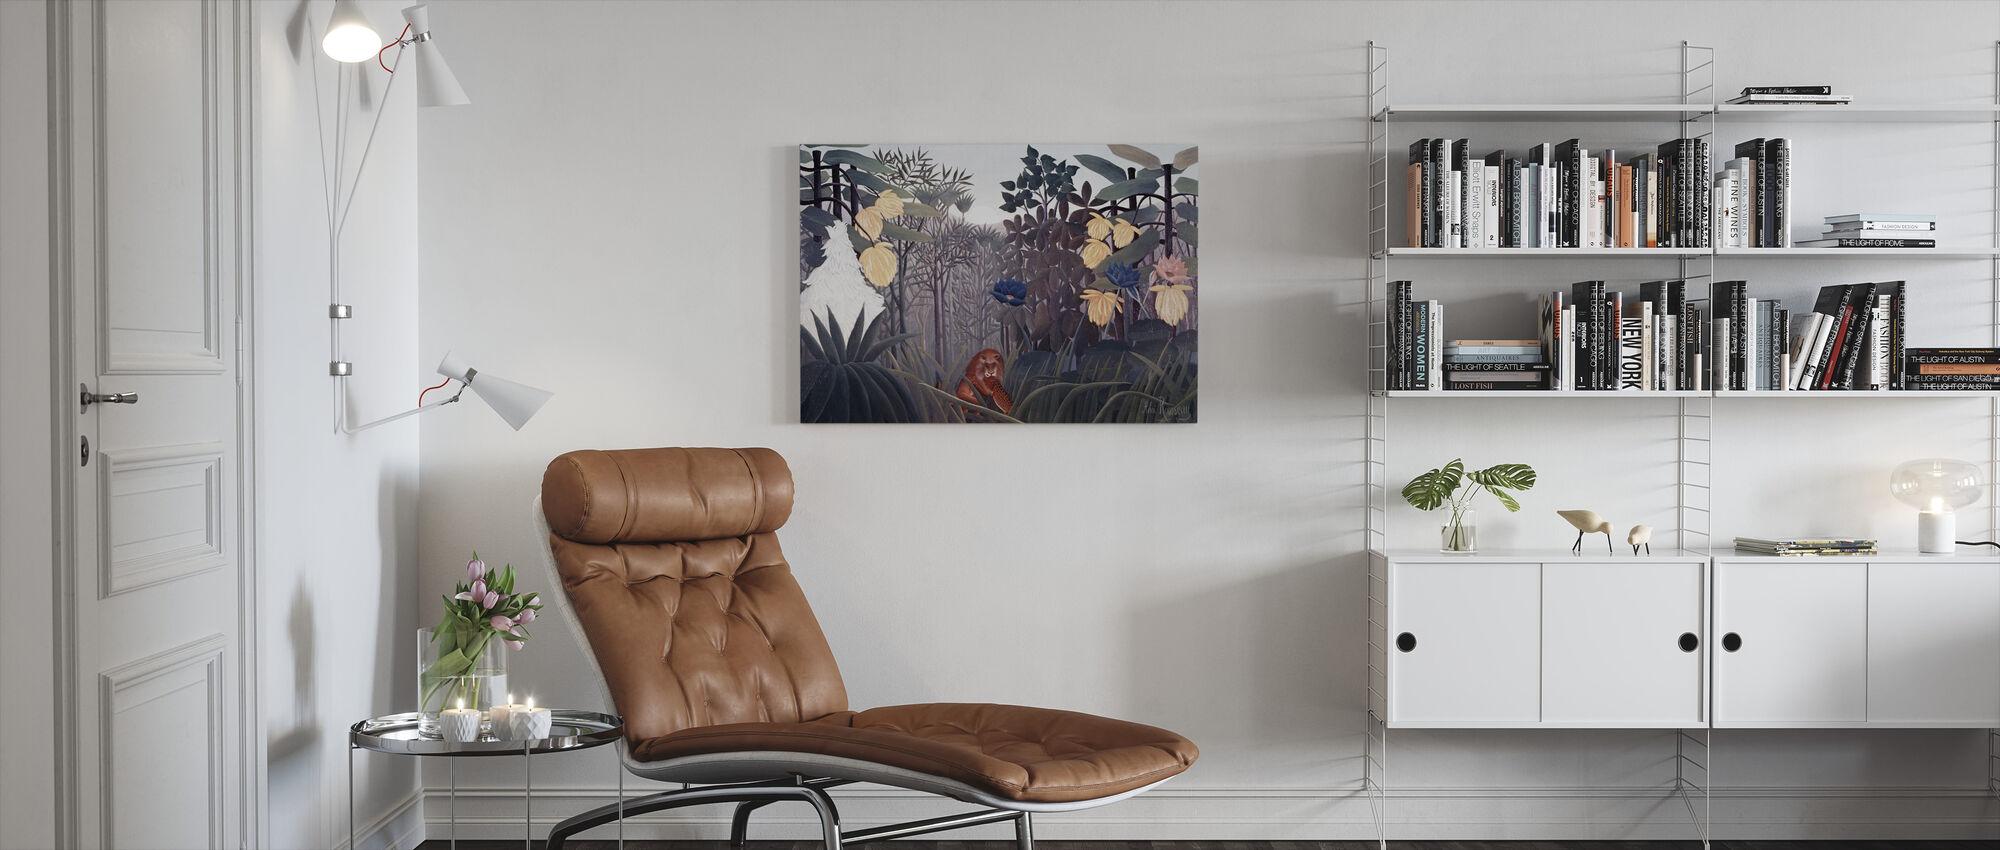 Repast of the Lion - Henri Rousseau - Canvas print - Living Room